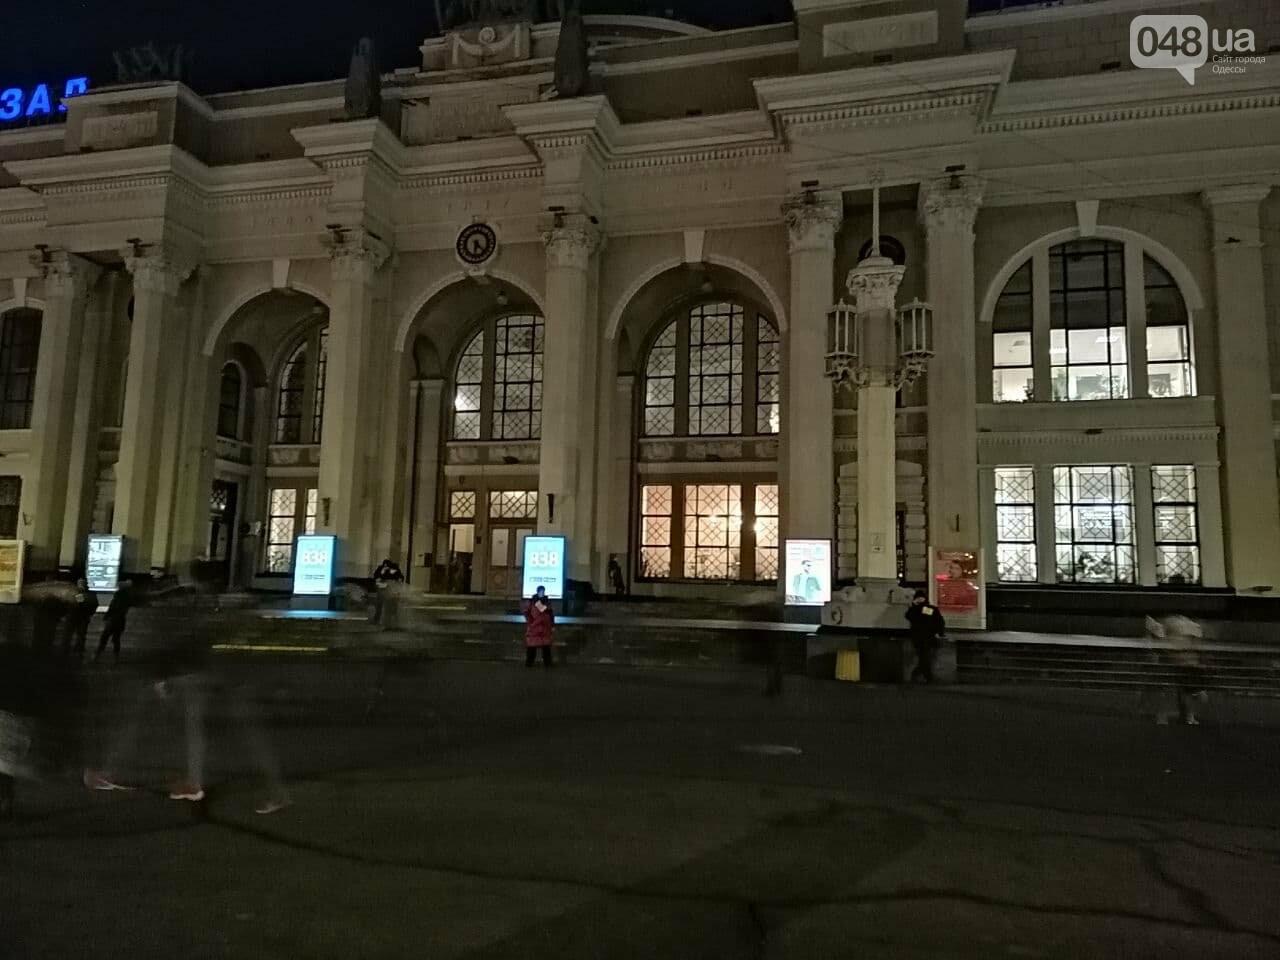 В Одессе таксисты позвали всех на митинг, а сами не приехали,- ФОТО, фото-2